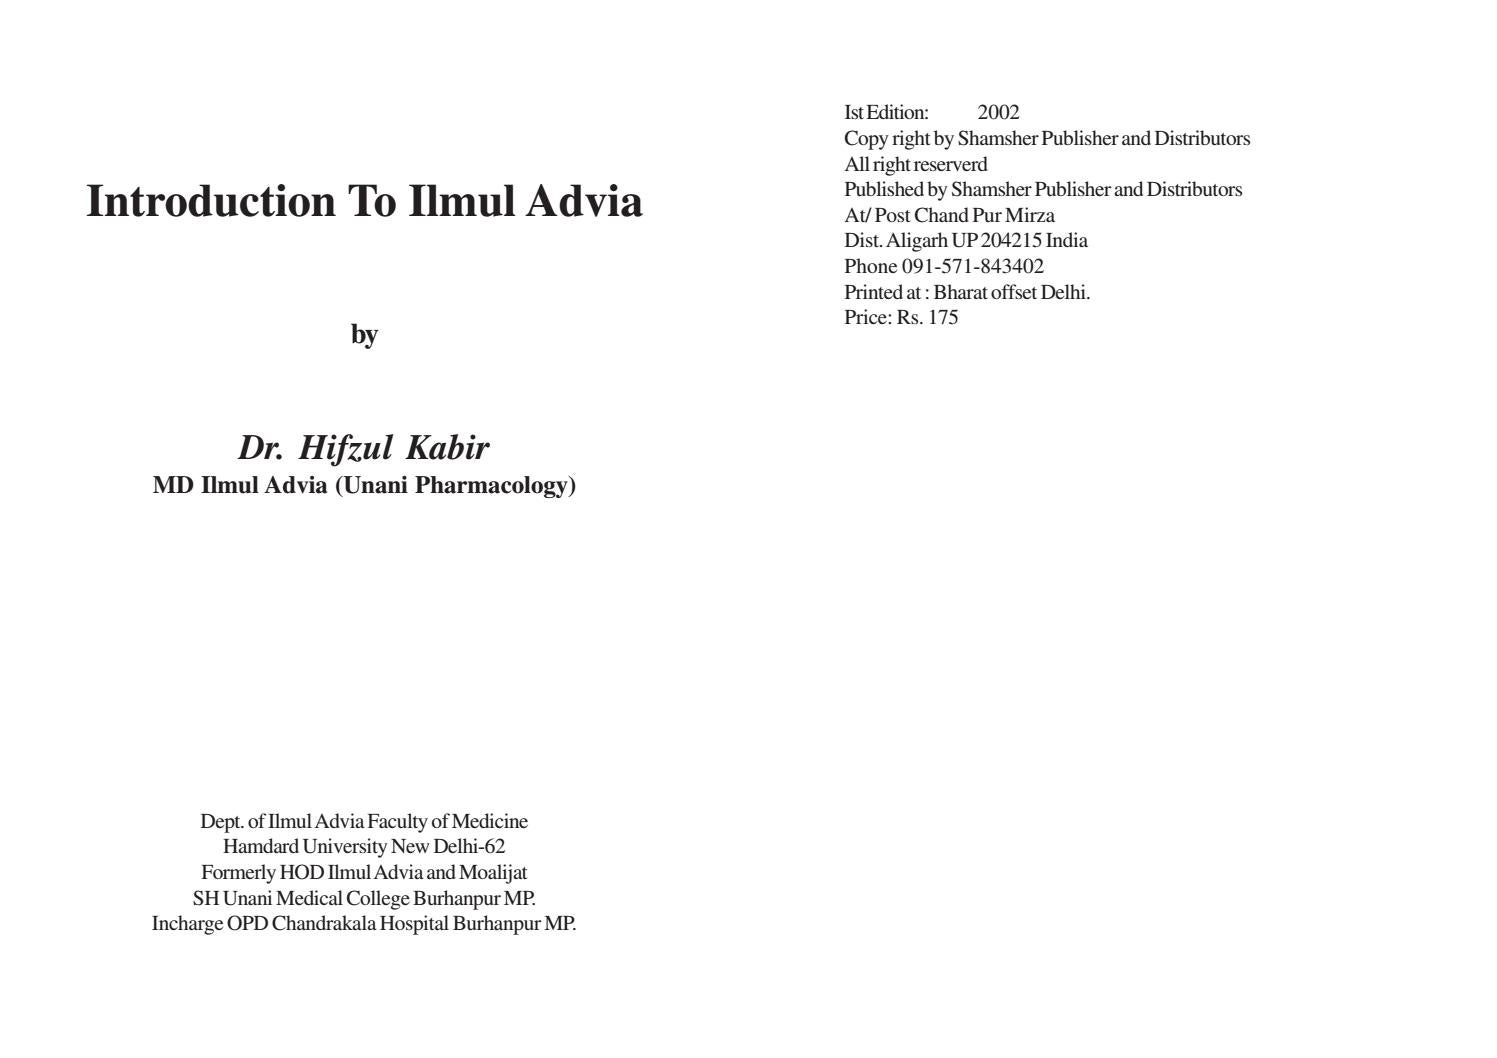 Introduction to ilmul advia by Yawahabo - issuu